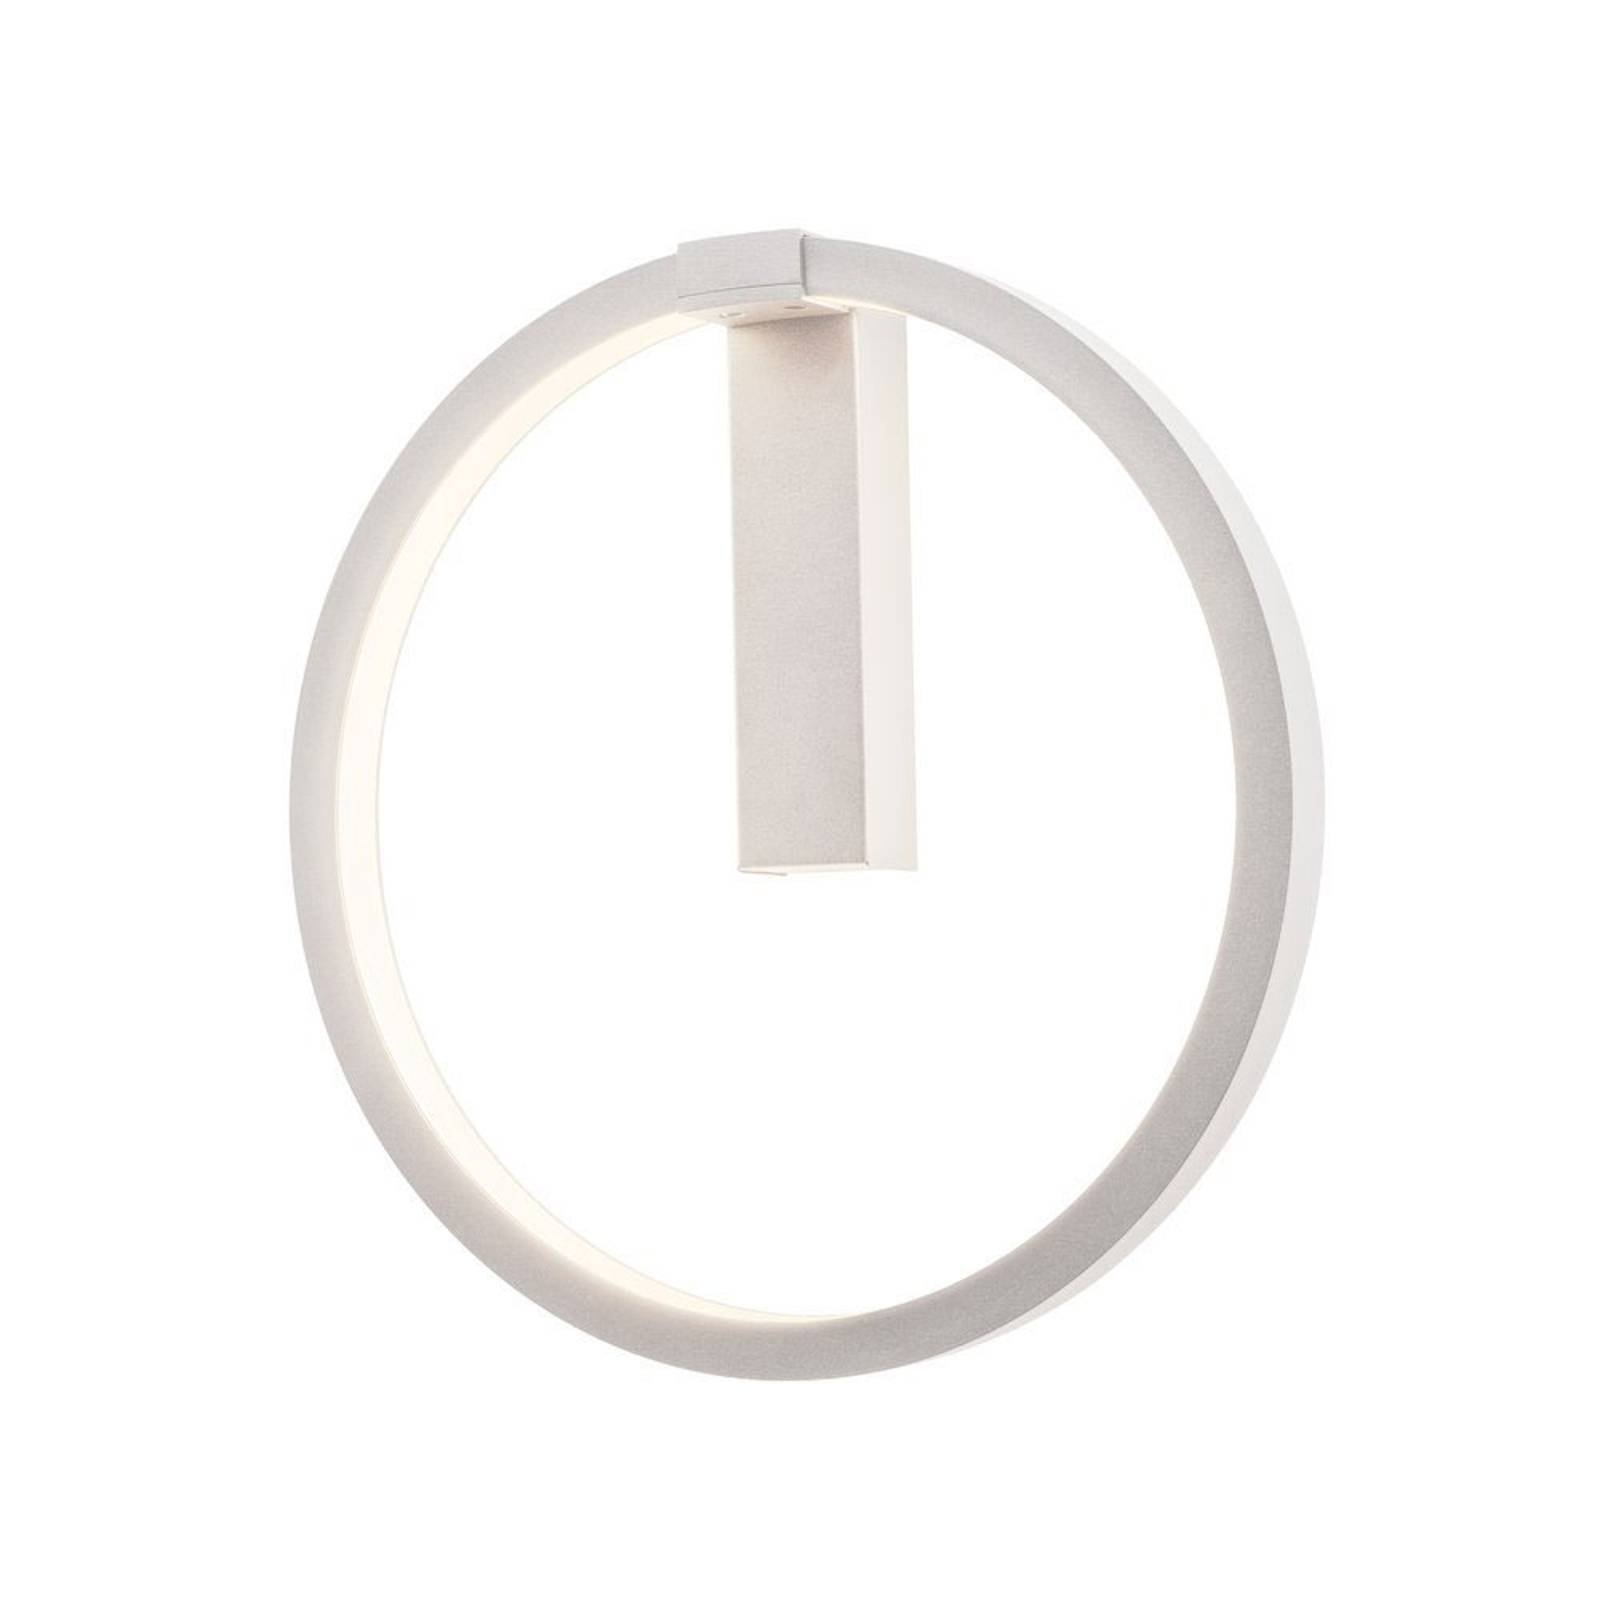 SLV One LED-vegglampe, DALI, hvit, Ø 40 cm